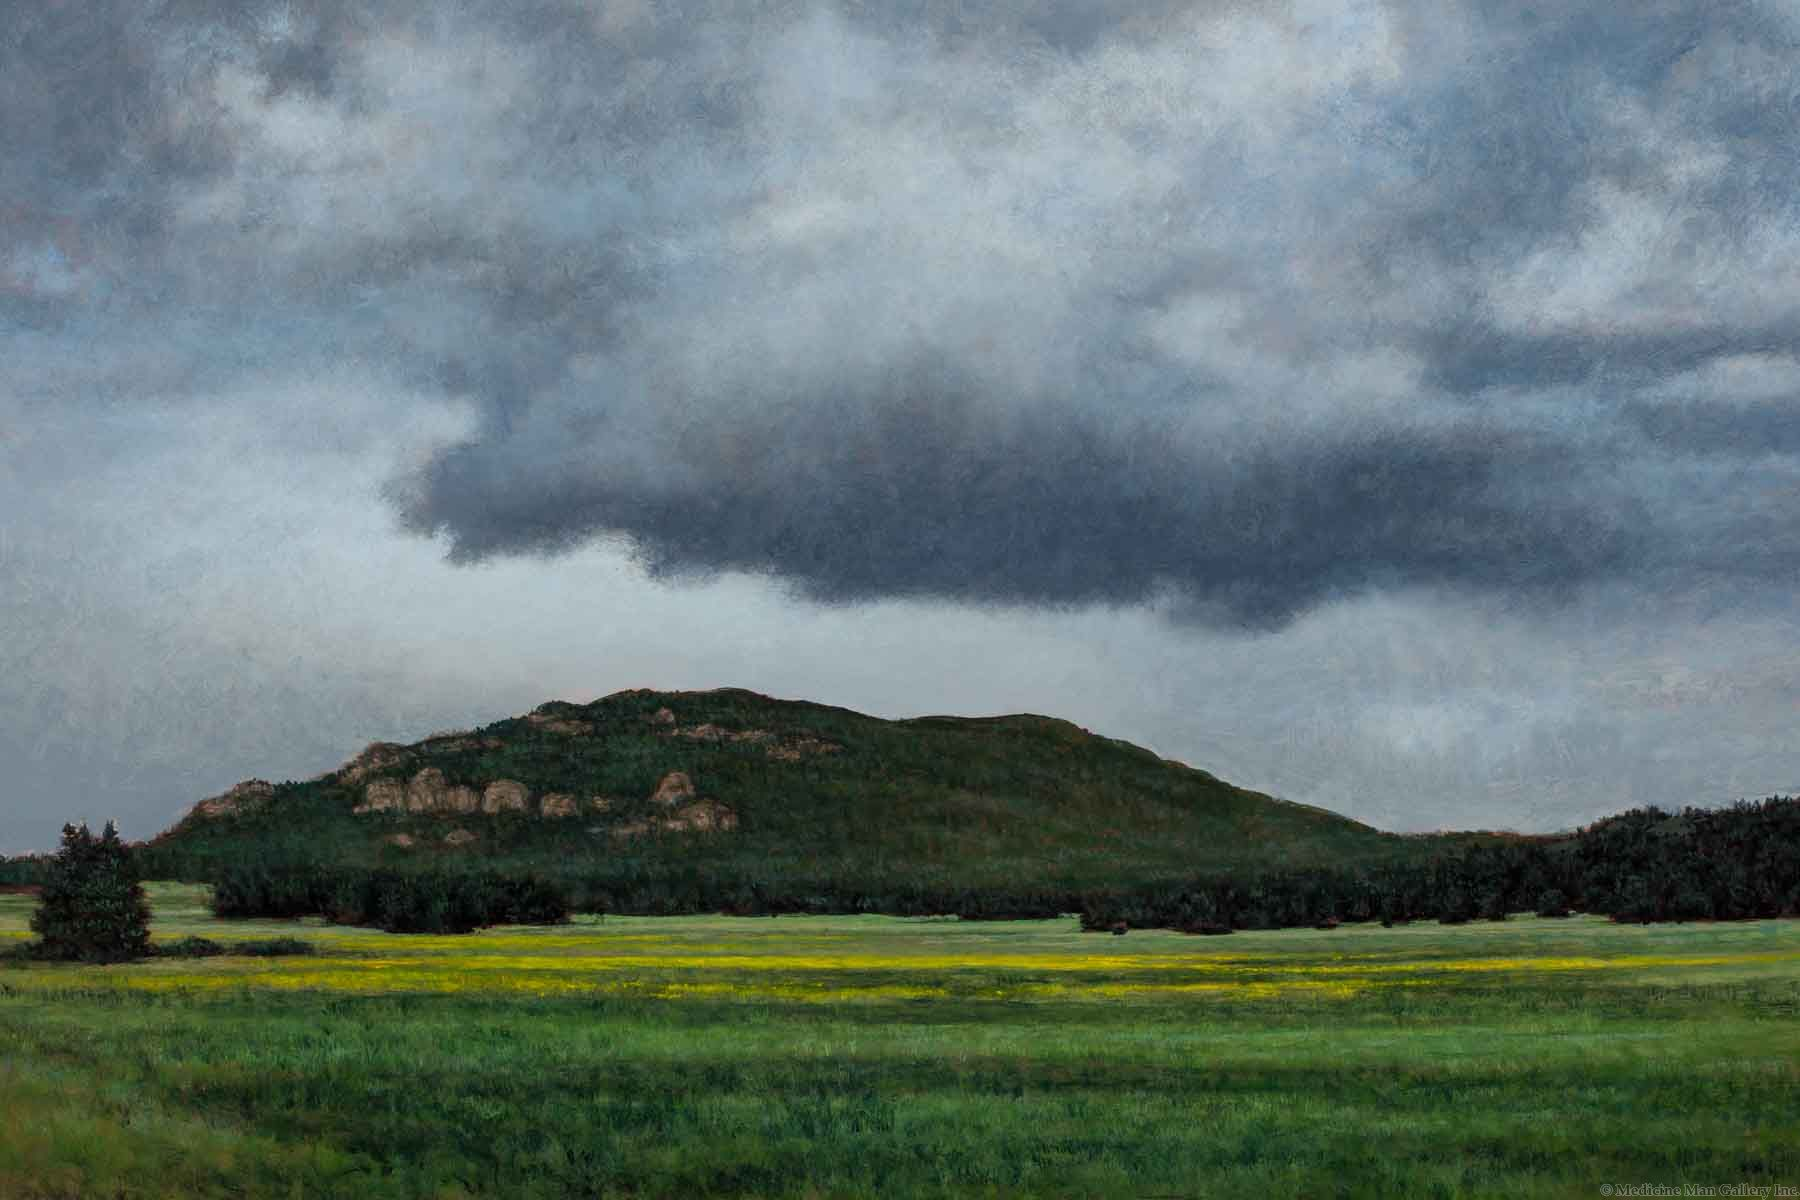 Jeff Aeling - Rain on the Rockies, Co.